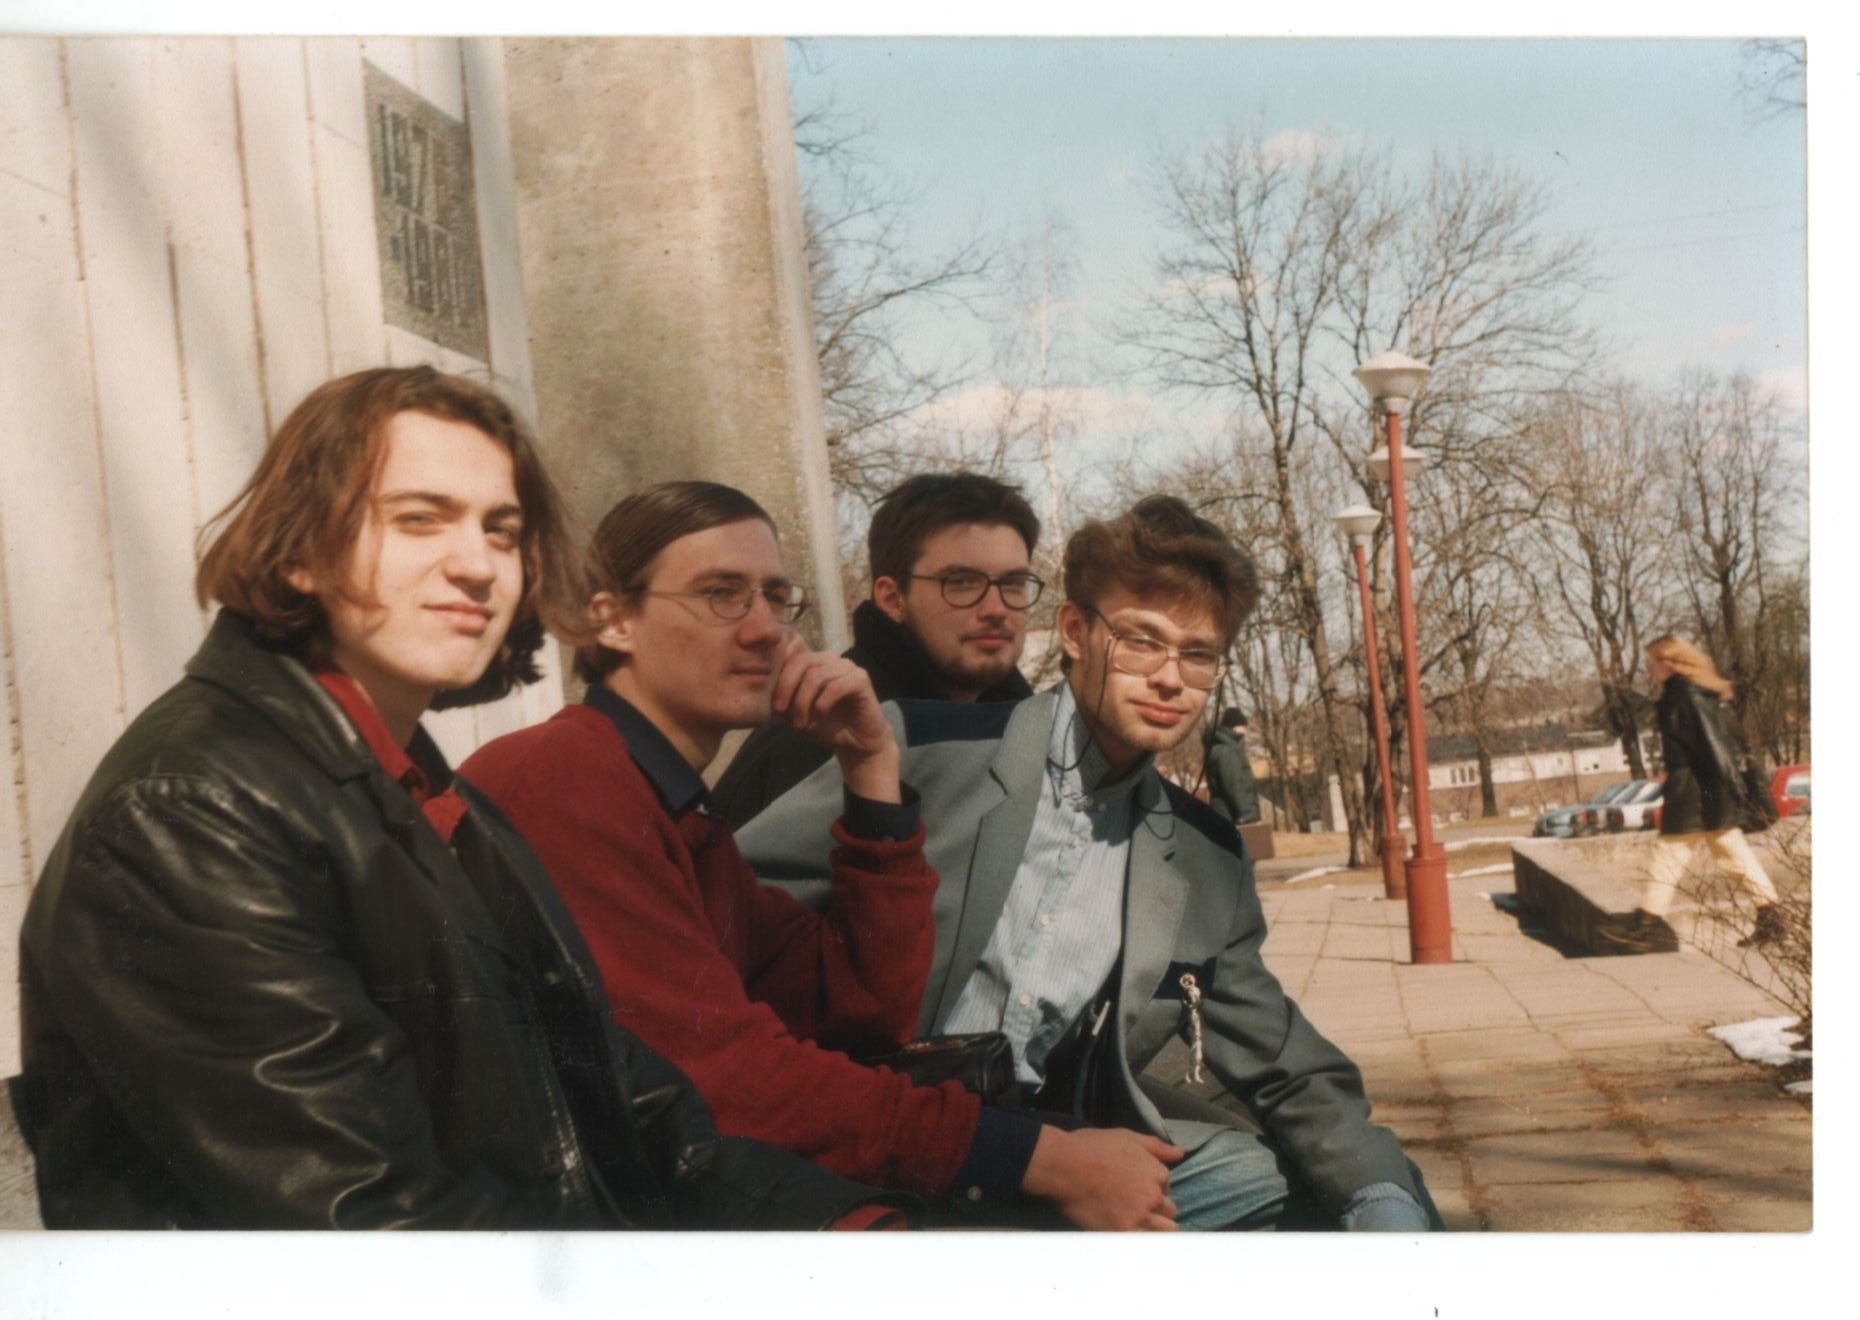 Osa Erakkonnast. Pildil (vasakult): Andreas Kalkun, Kalju Kruusa, Aare Pilv, Berk Vaher. Aprill 1997. Foto: erakogu